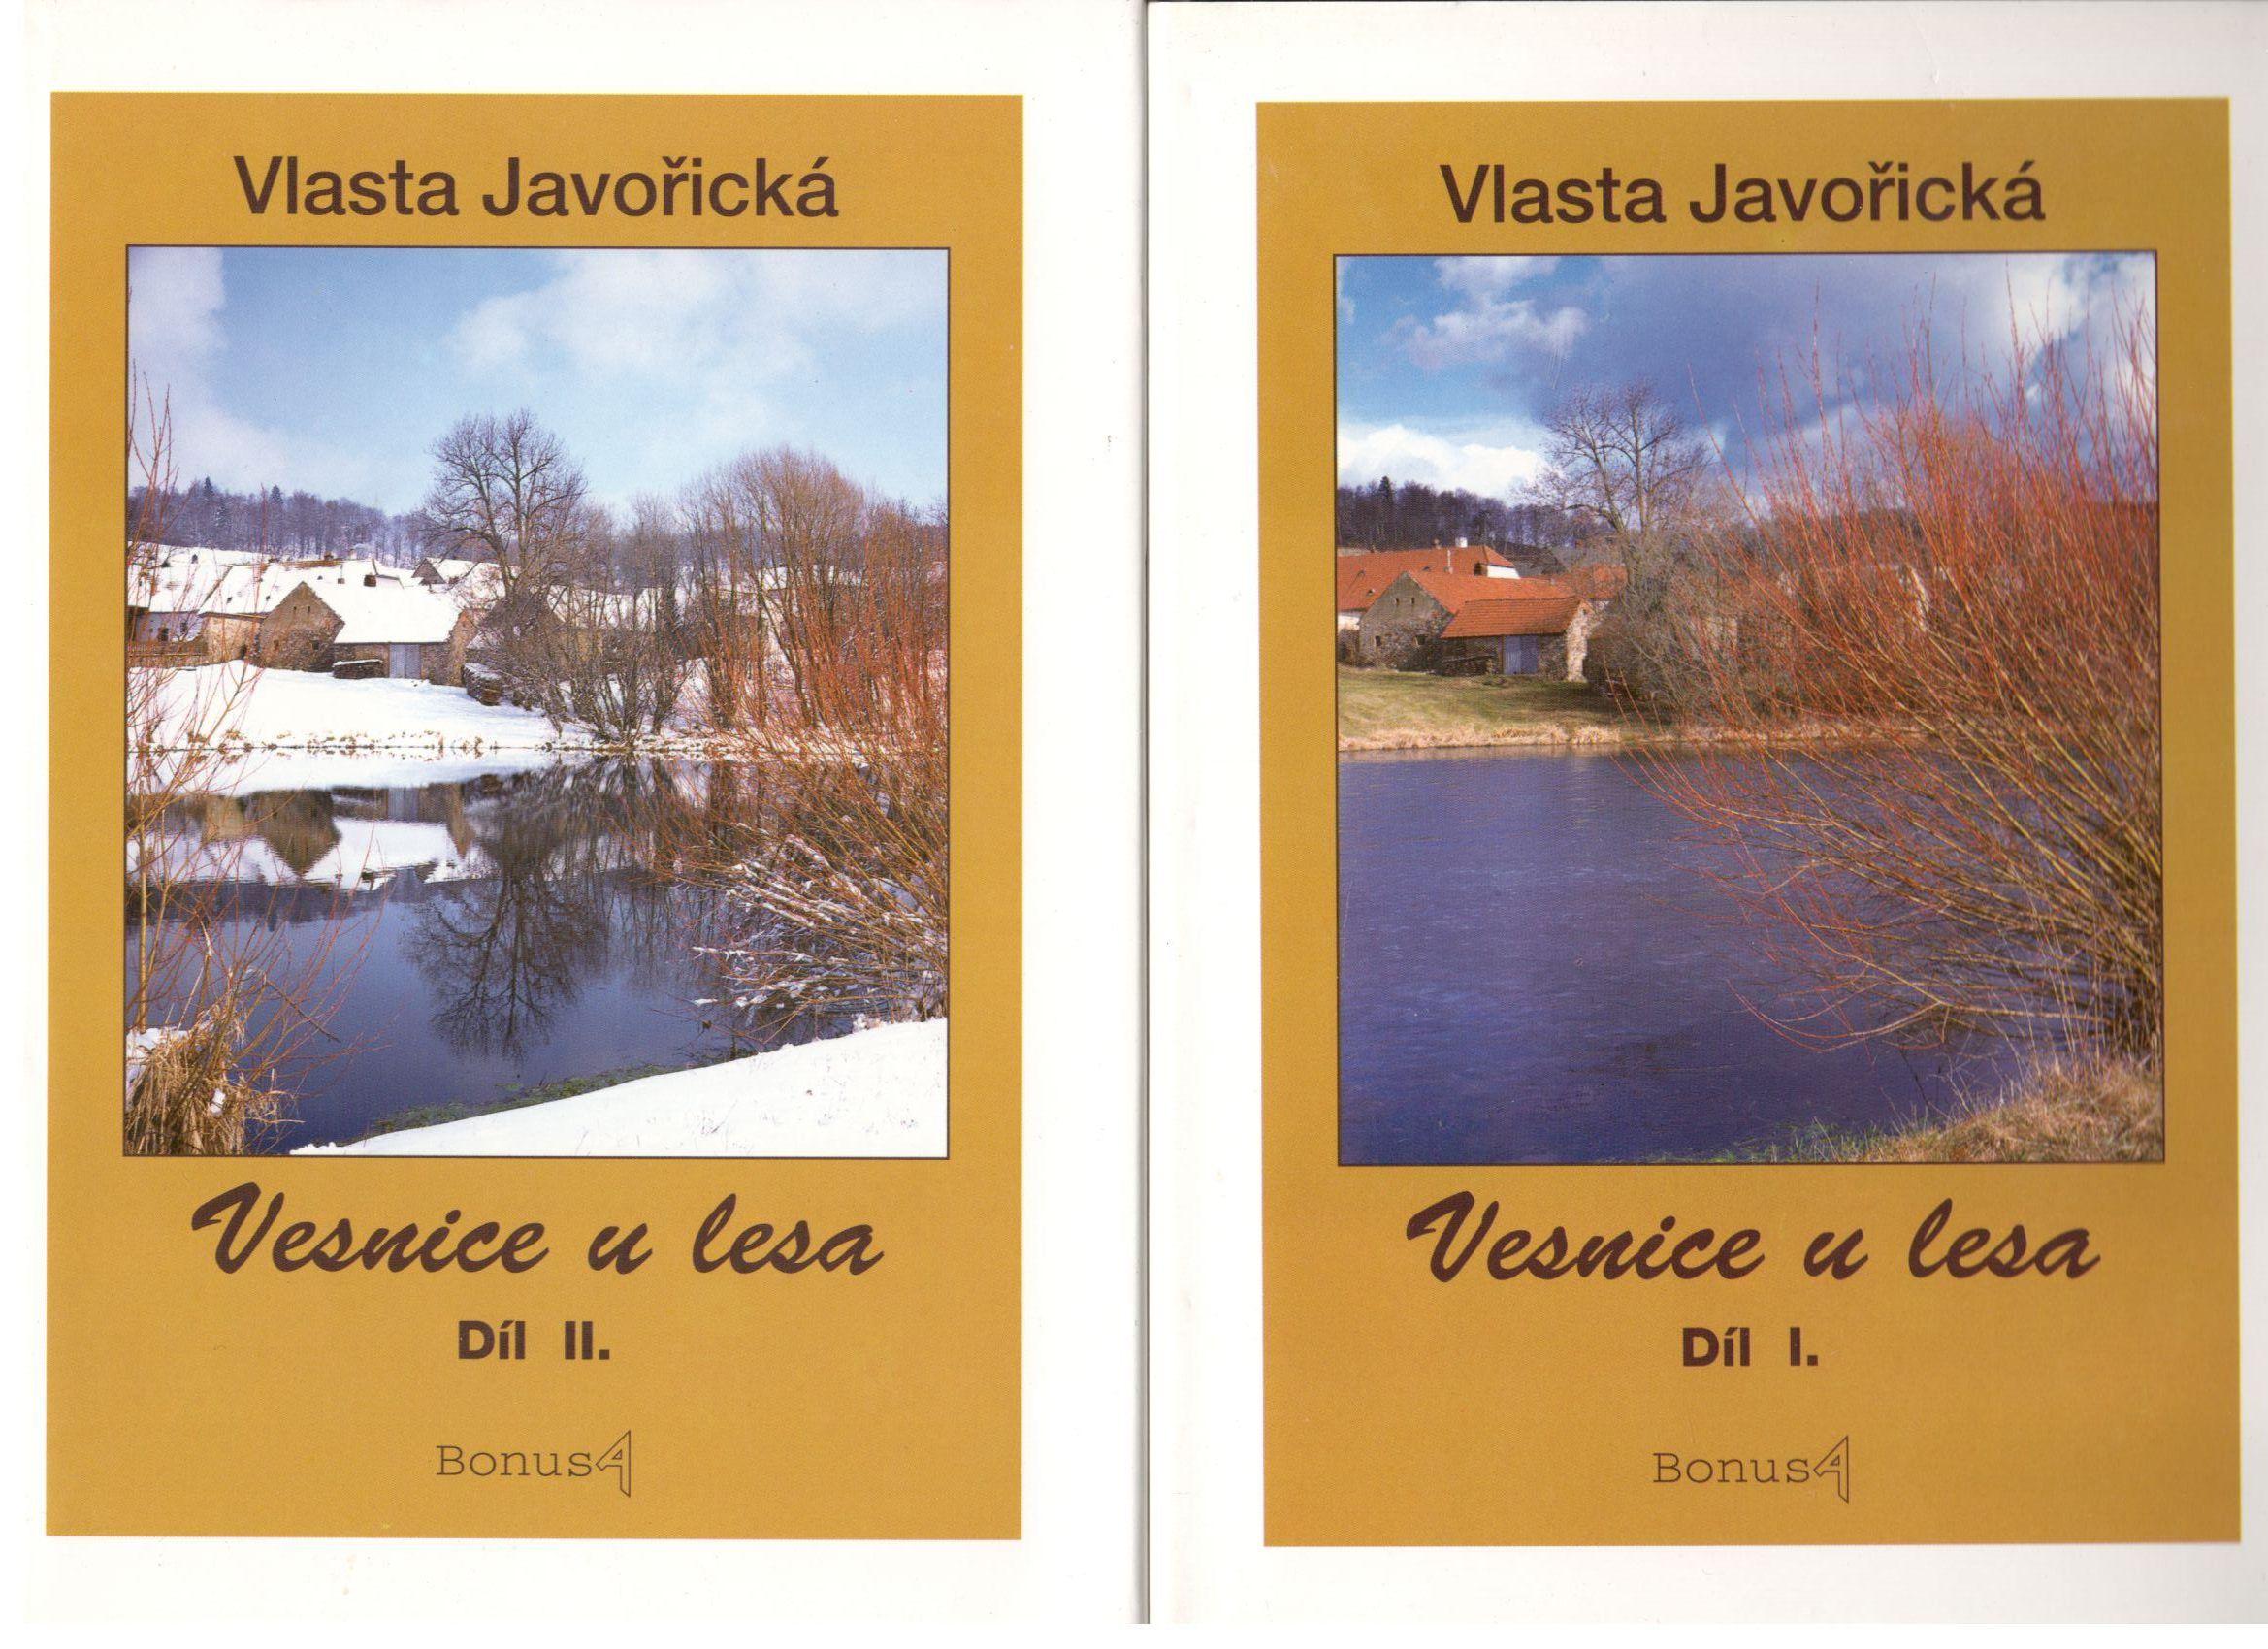 Vesnice u lesa I.+ II. díl - Vlasta Javořická